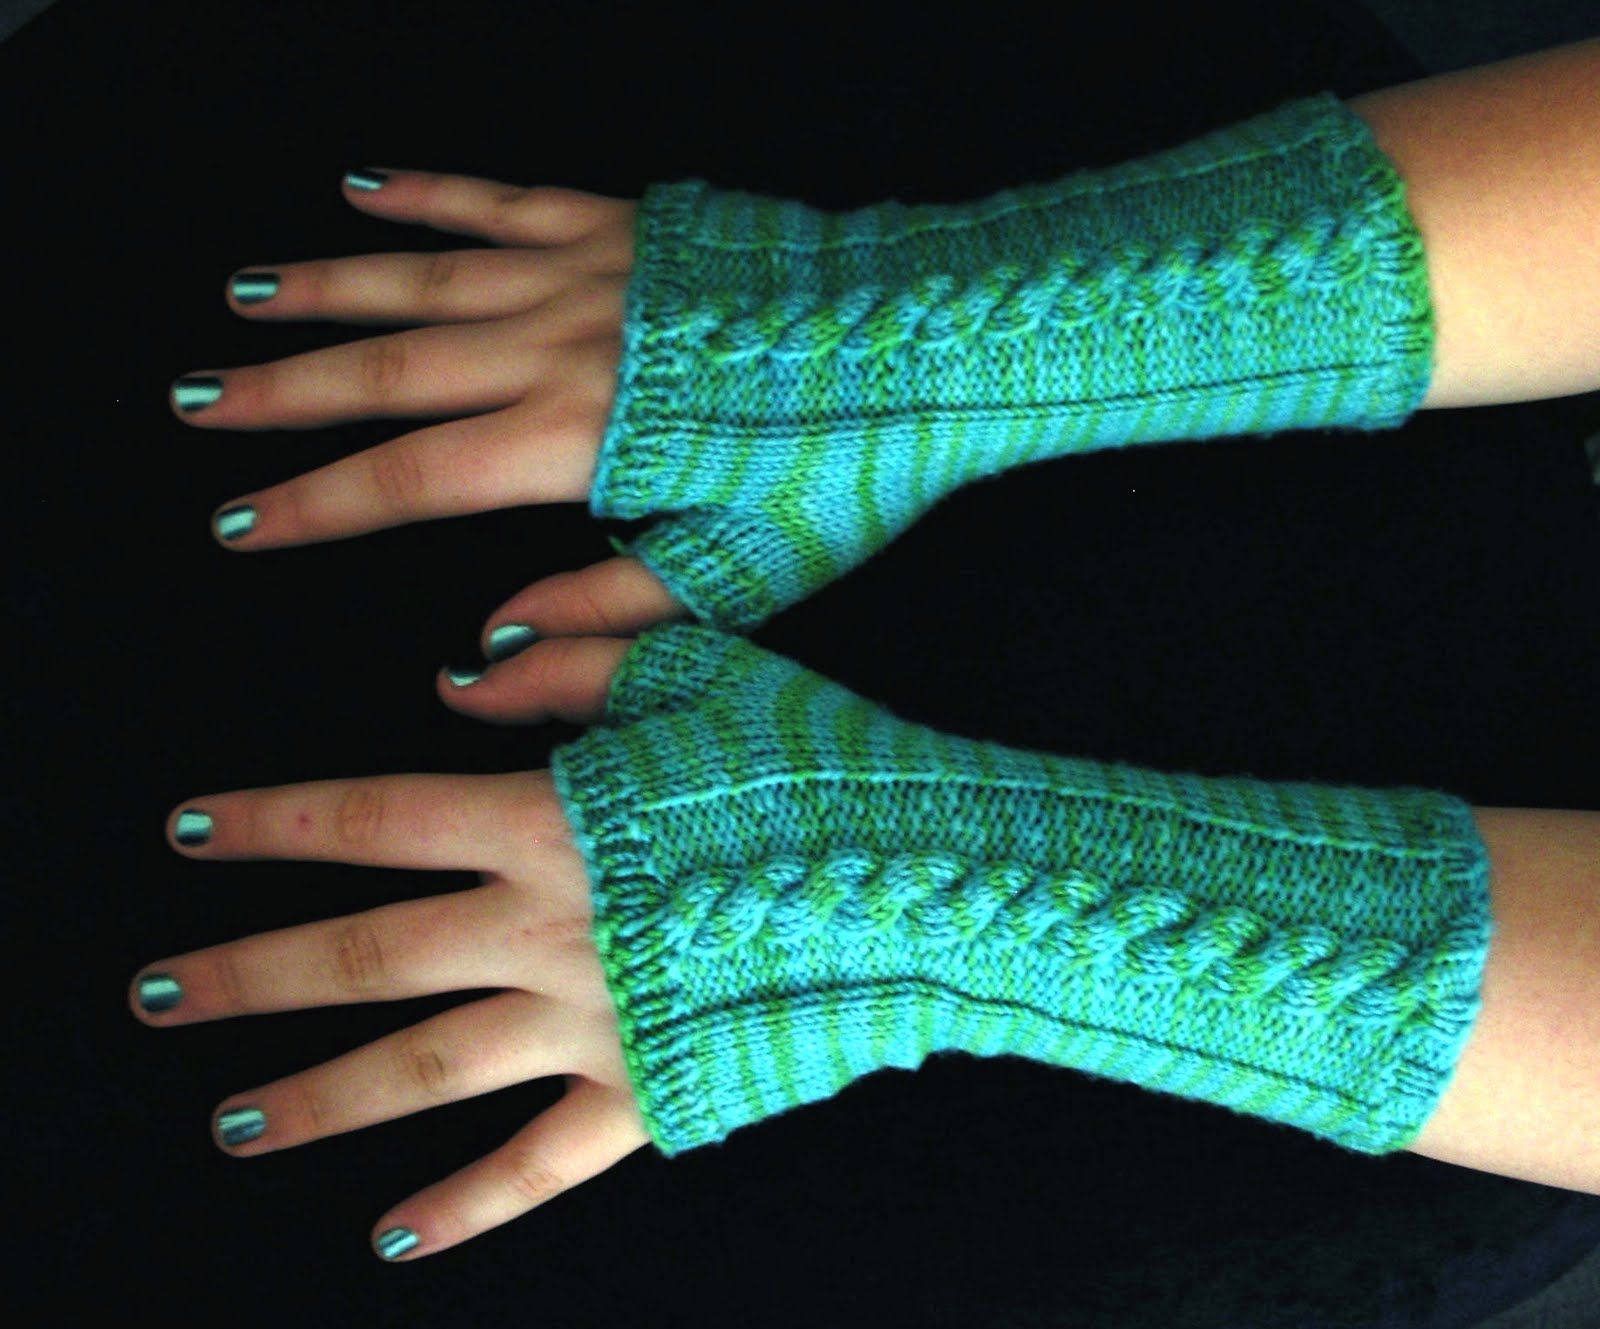 Free Pattern - Cabled Wrist Warmers | Wrist warmers ...